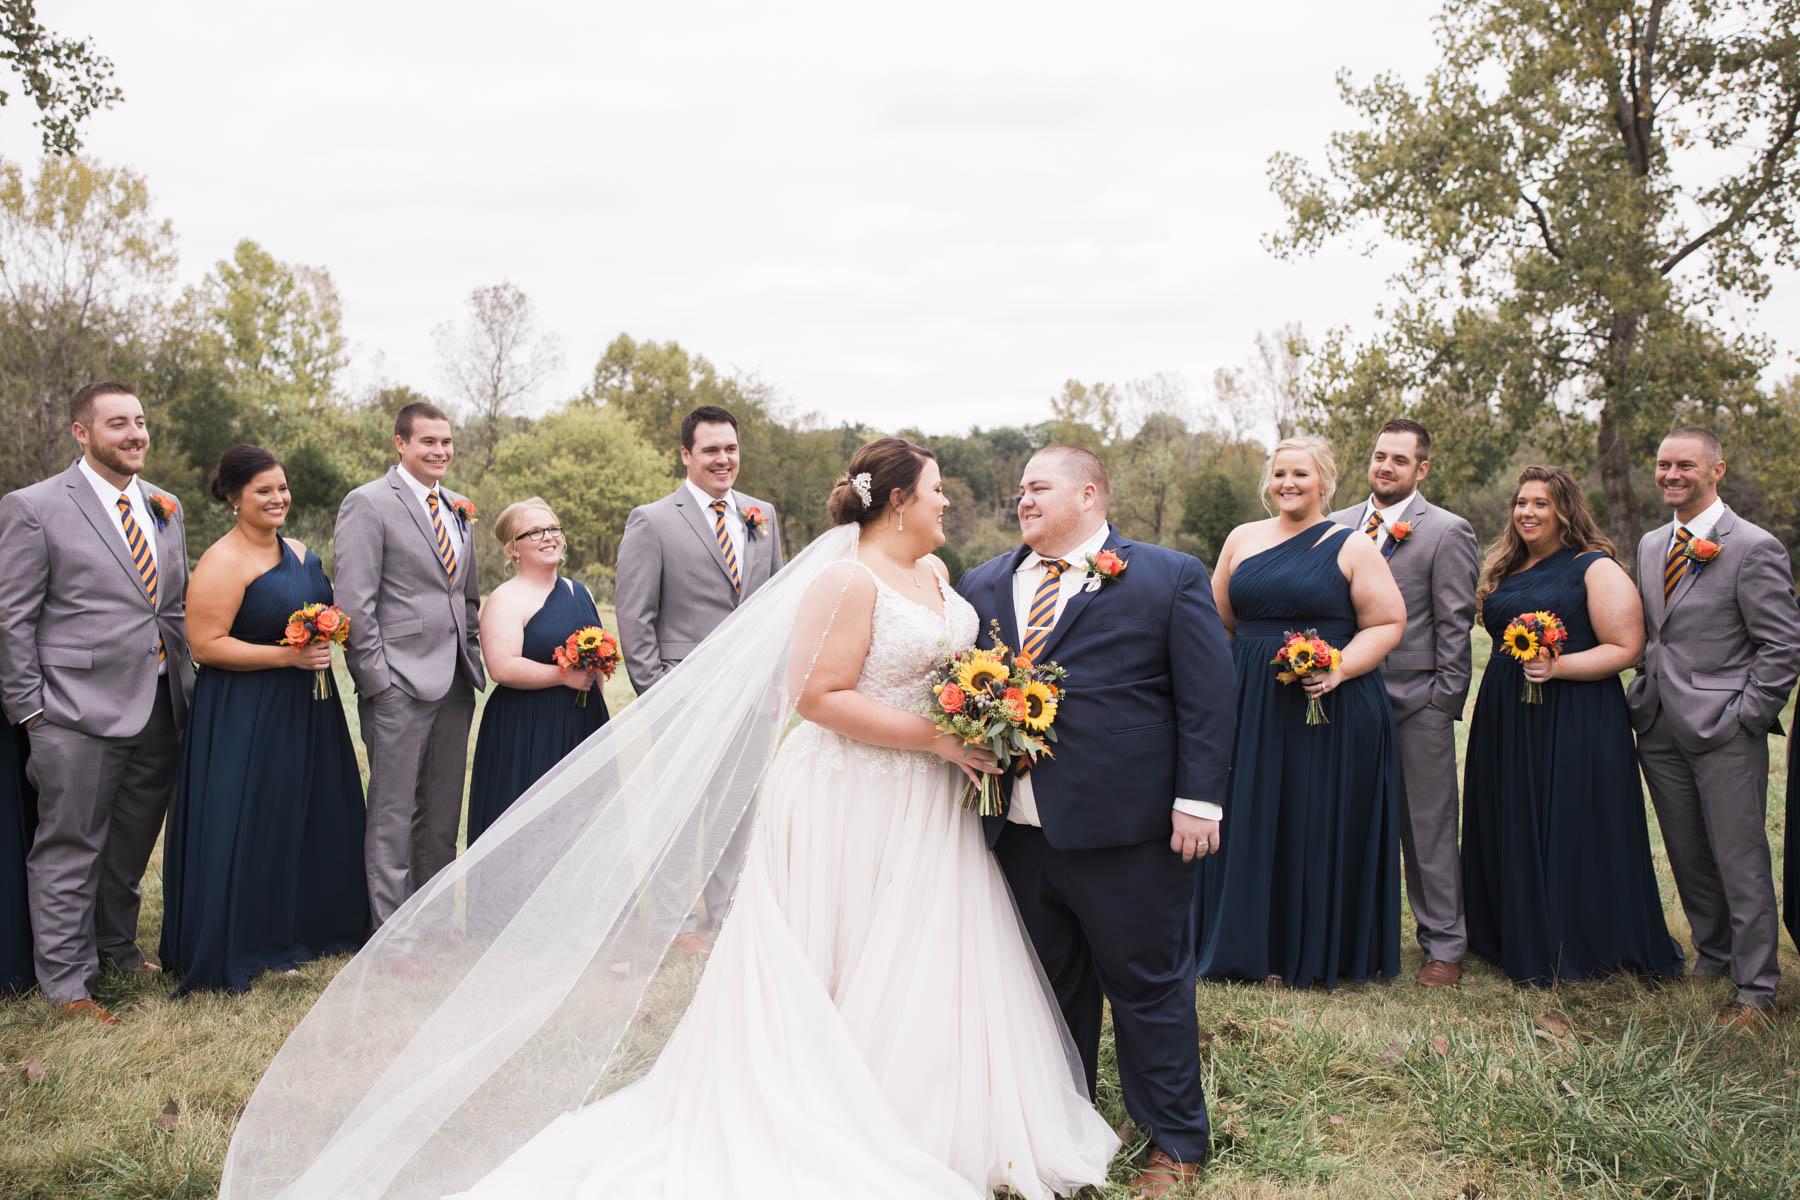 shotbychelsea_wedding_photography_blog-13.jpg